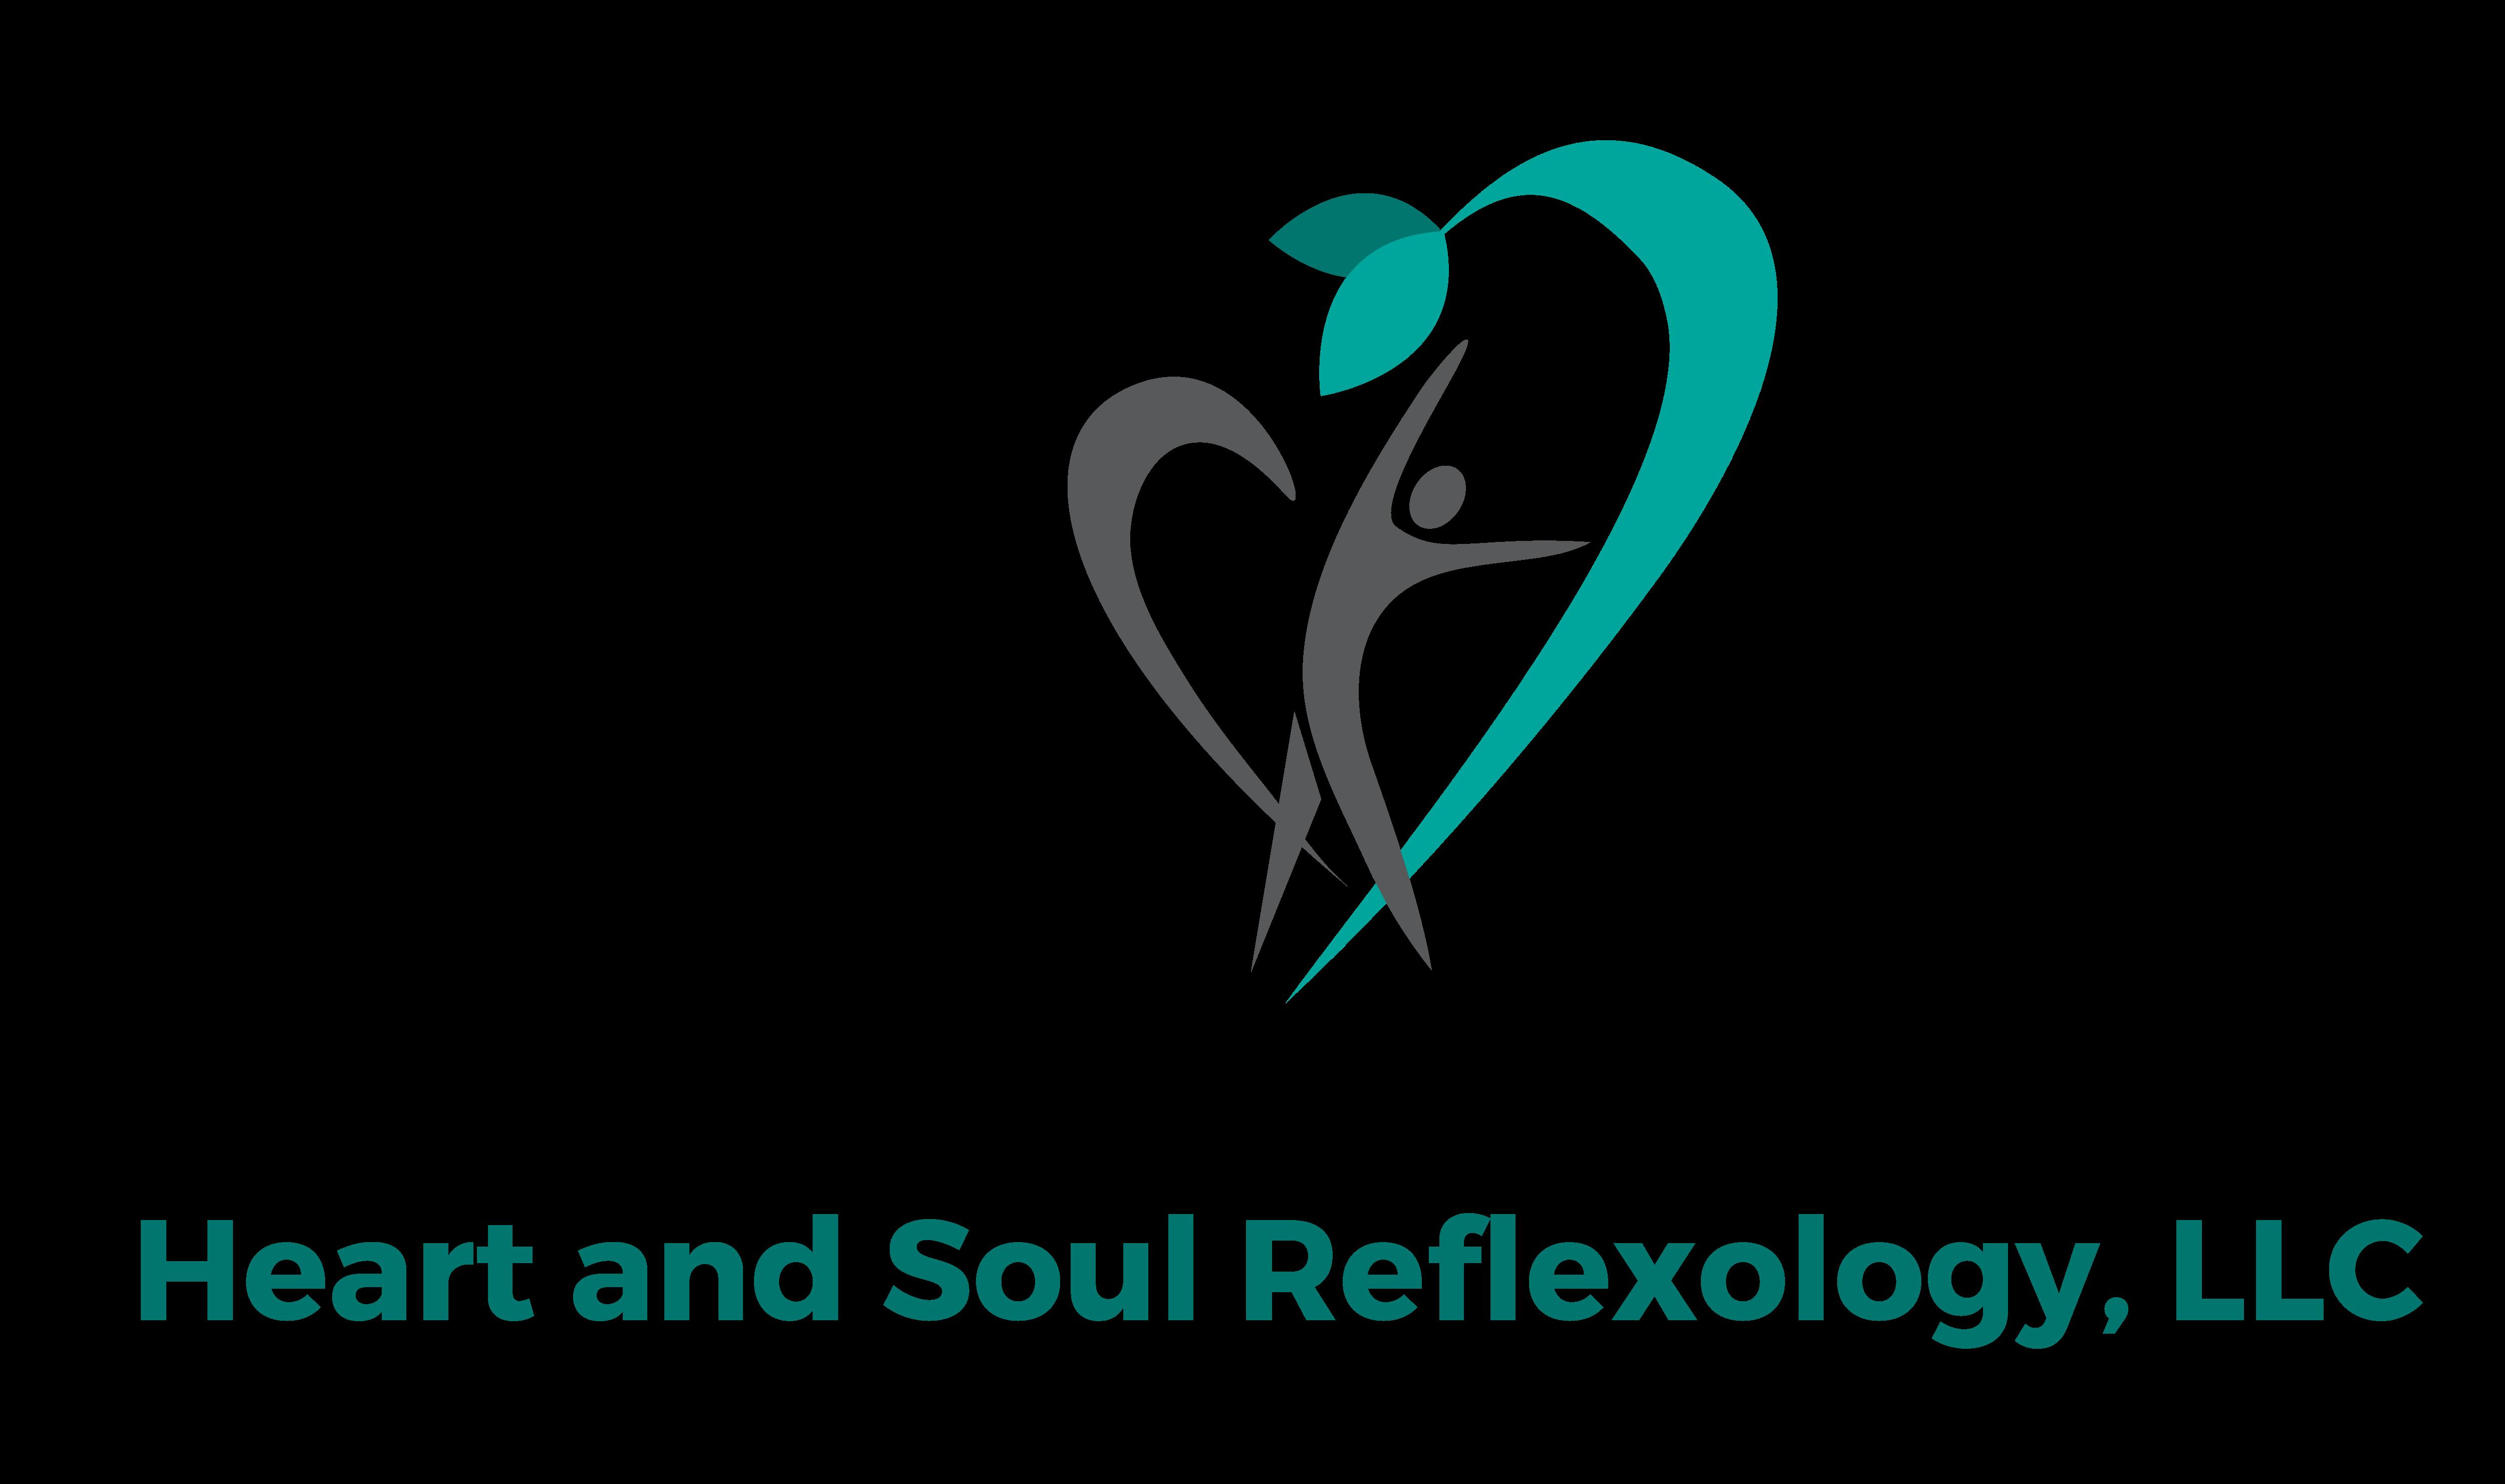 Heart and soul reflexology llc hudson wi reflexology book heart and soul reflexology llc hudson wi reflexology book online xflitez Image collections